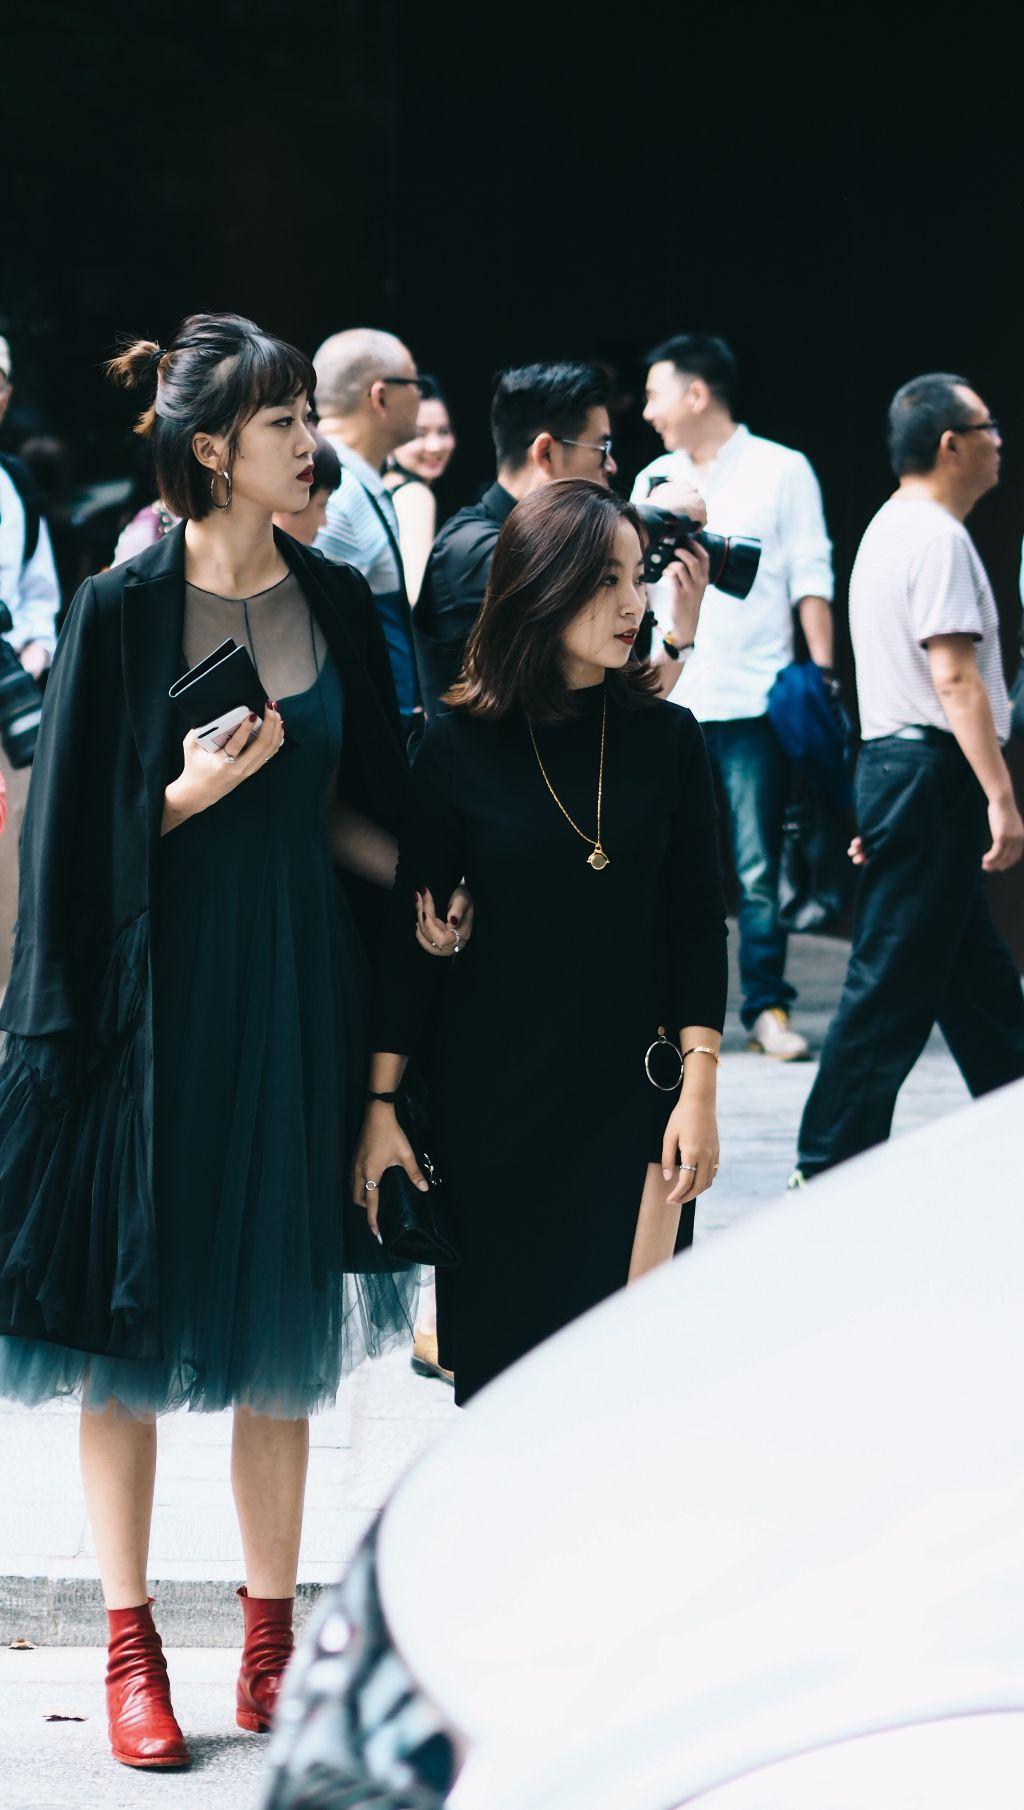 #shanghai #fashionwek #people #style #fahsion #photography